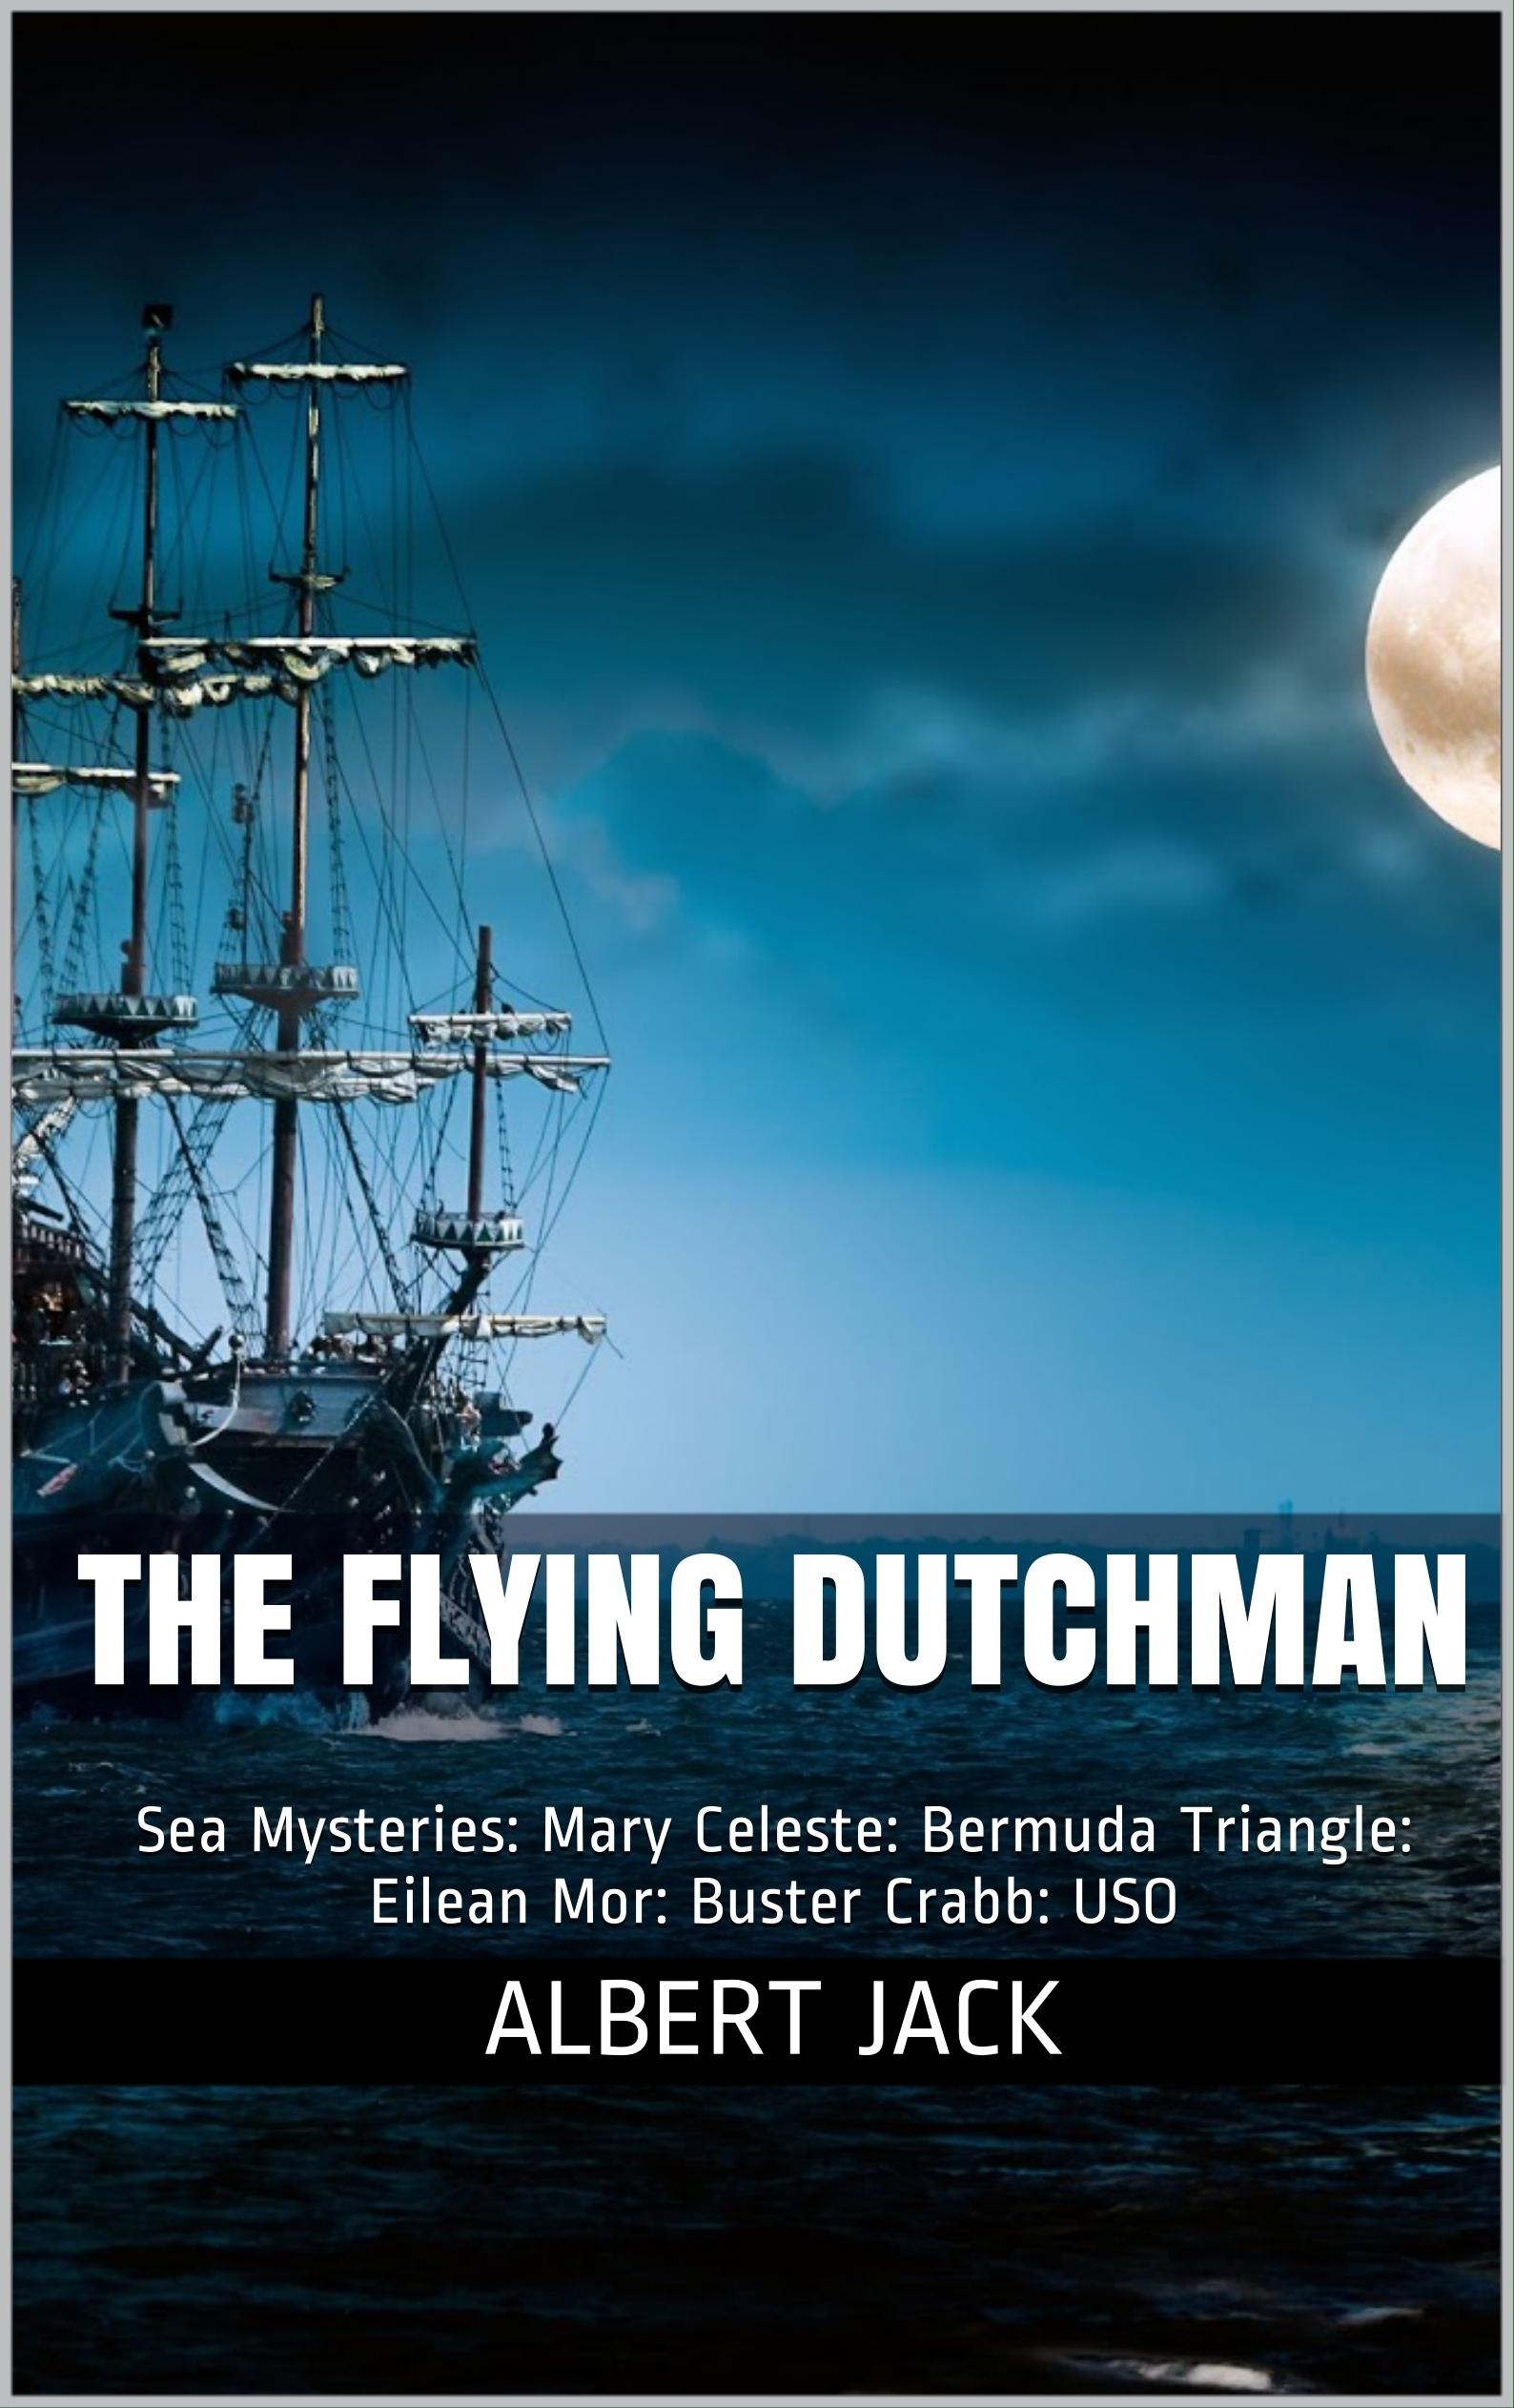 The Flying Dutchman: Sea Mysteries: Mary Celeste: Bermuda Triangle: Eilean Mor: Buster Crabb: USO